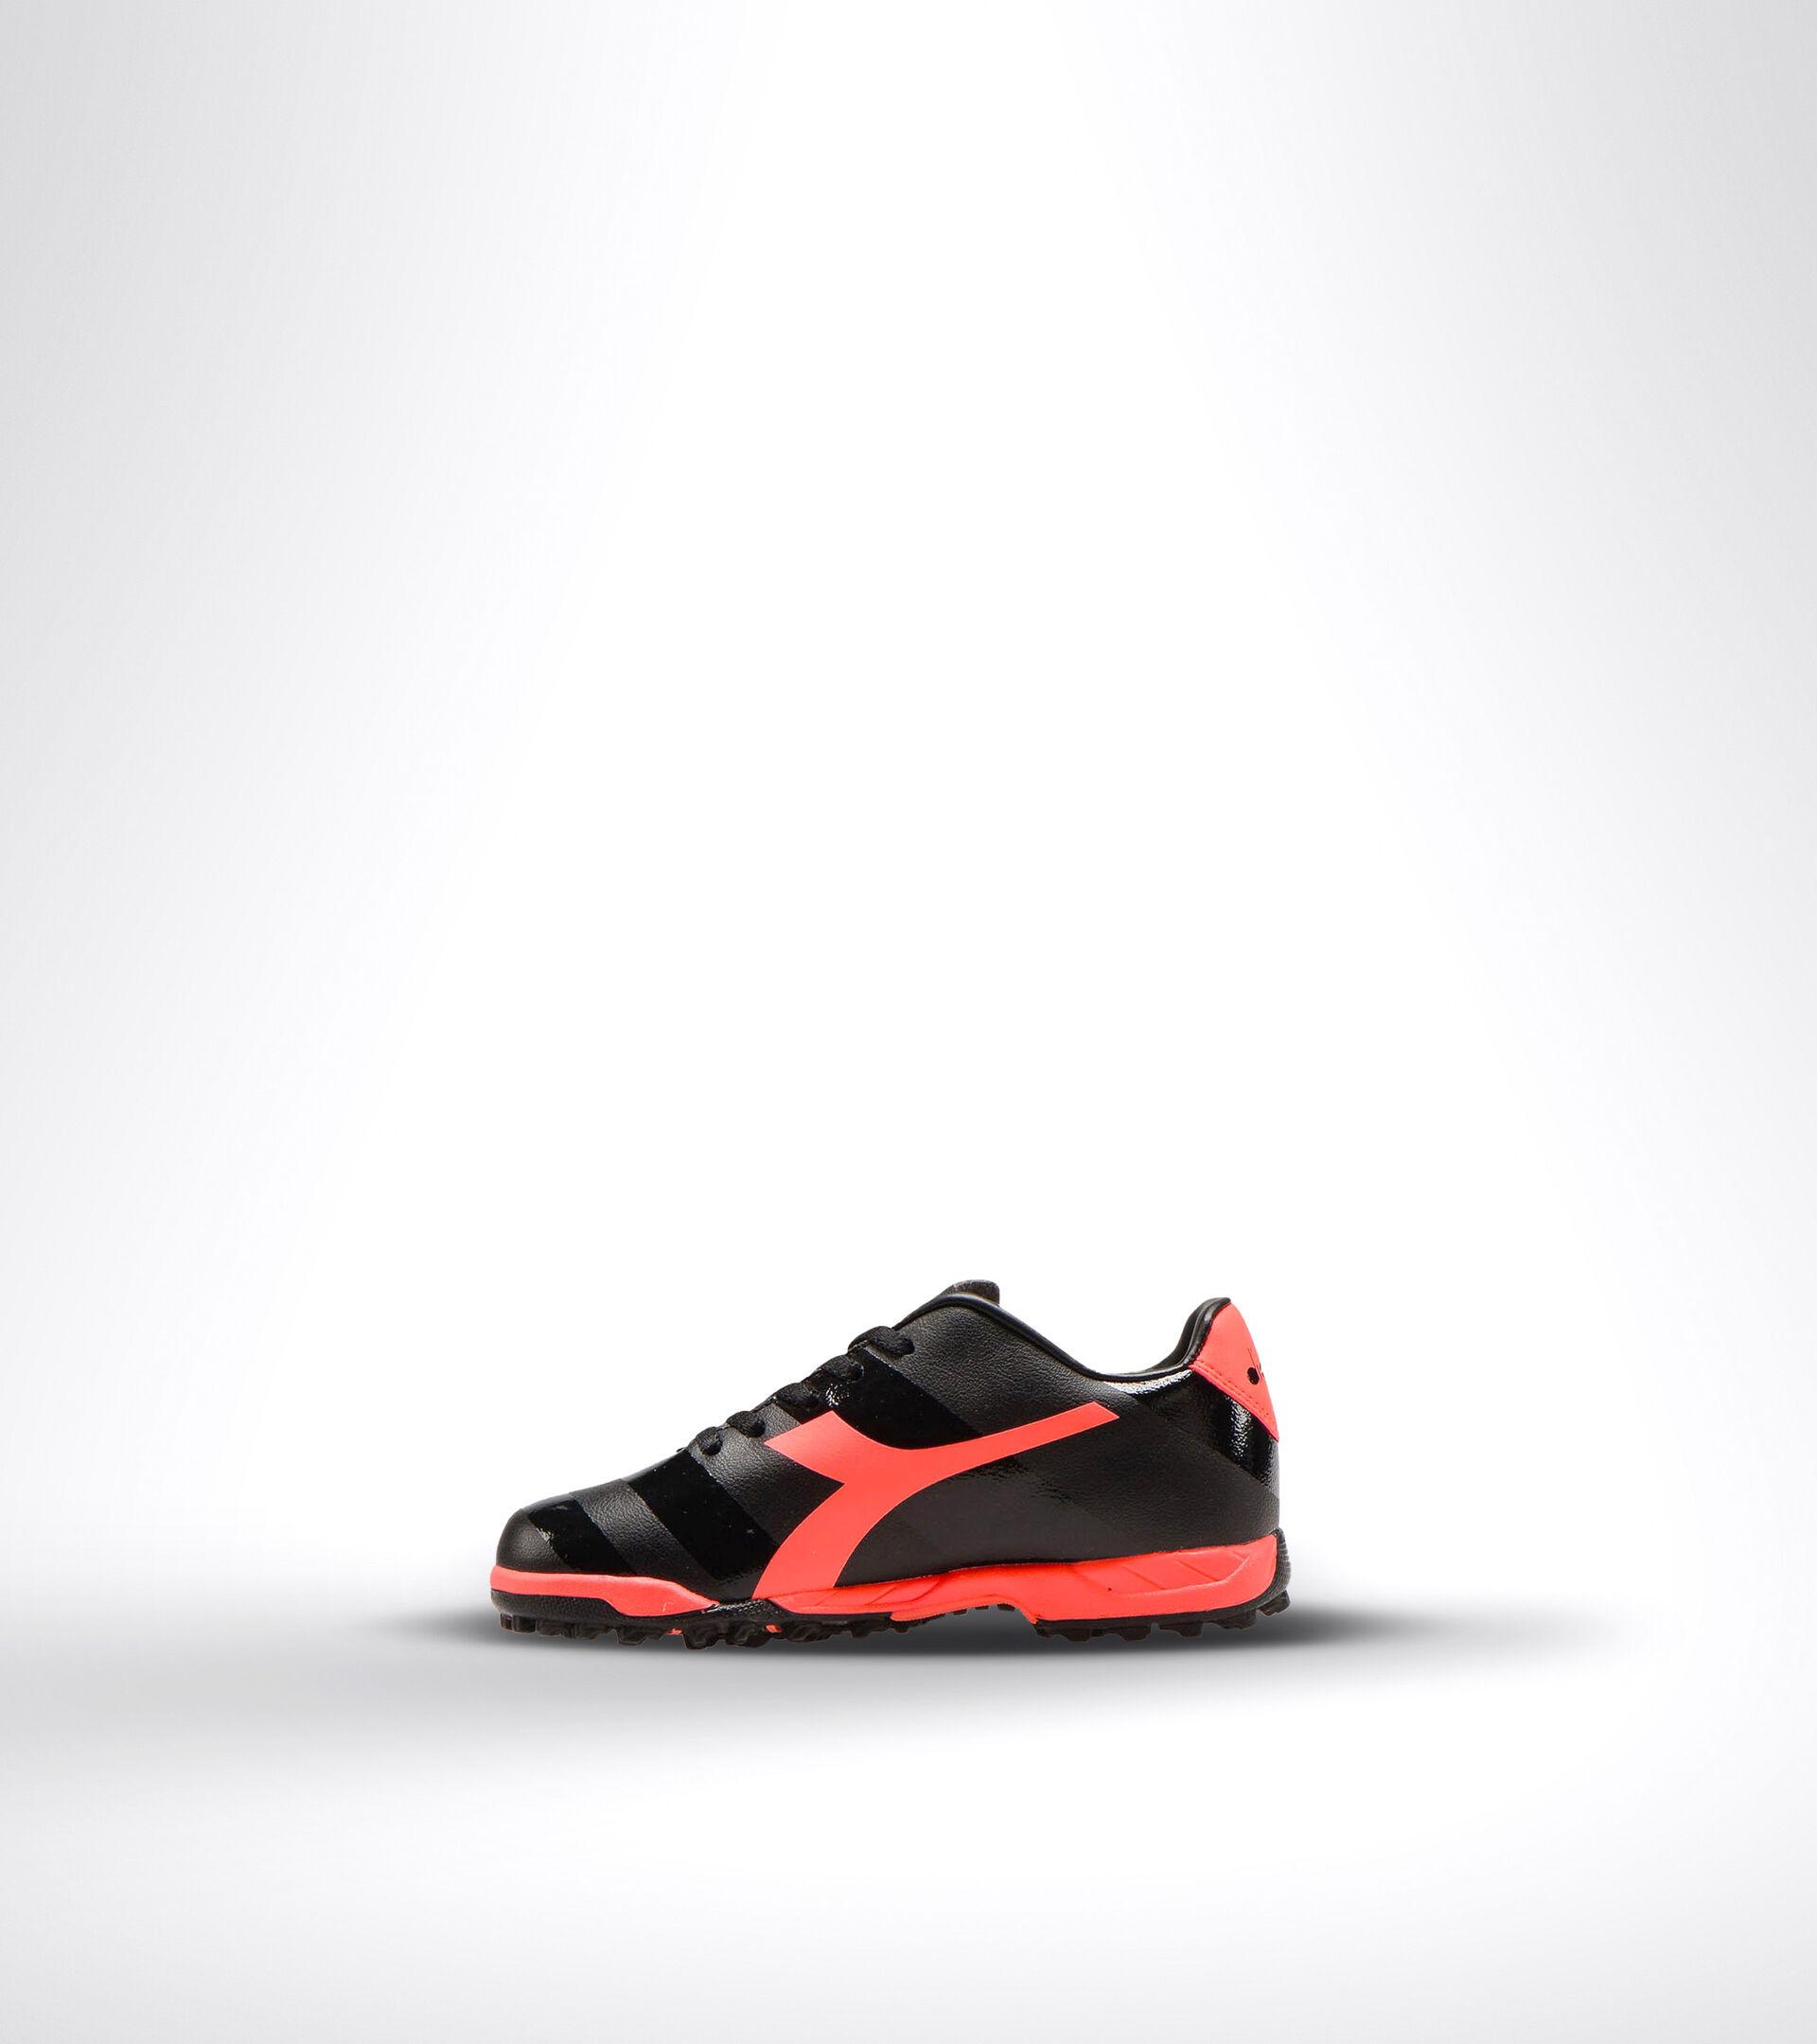 Hard ground and artificial turf football boot - Unisex kids RAPTOR R TF JR BLACK/RED FLUO - Diadora